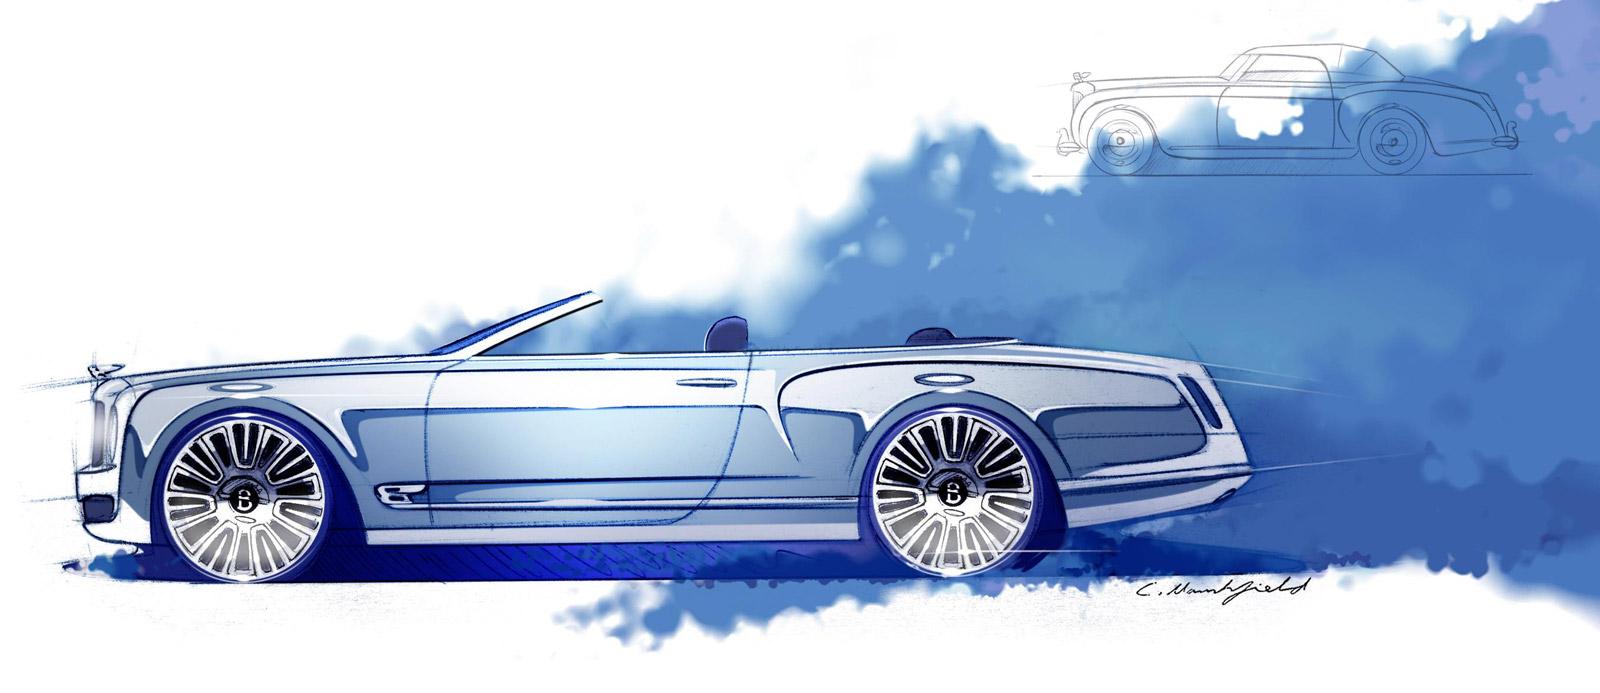 Bentley Mulls Expanding Mulsanne Range Suv Production In